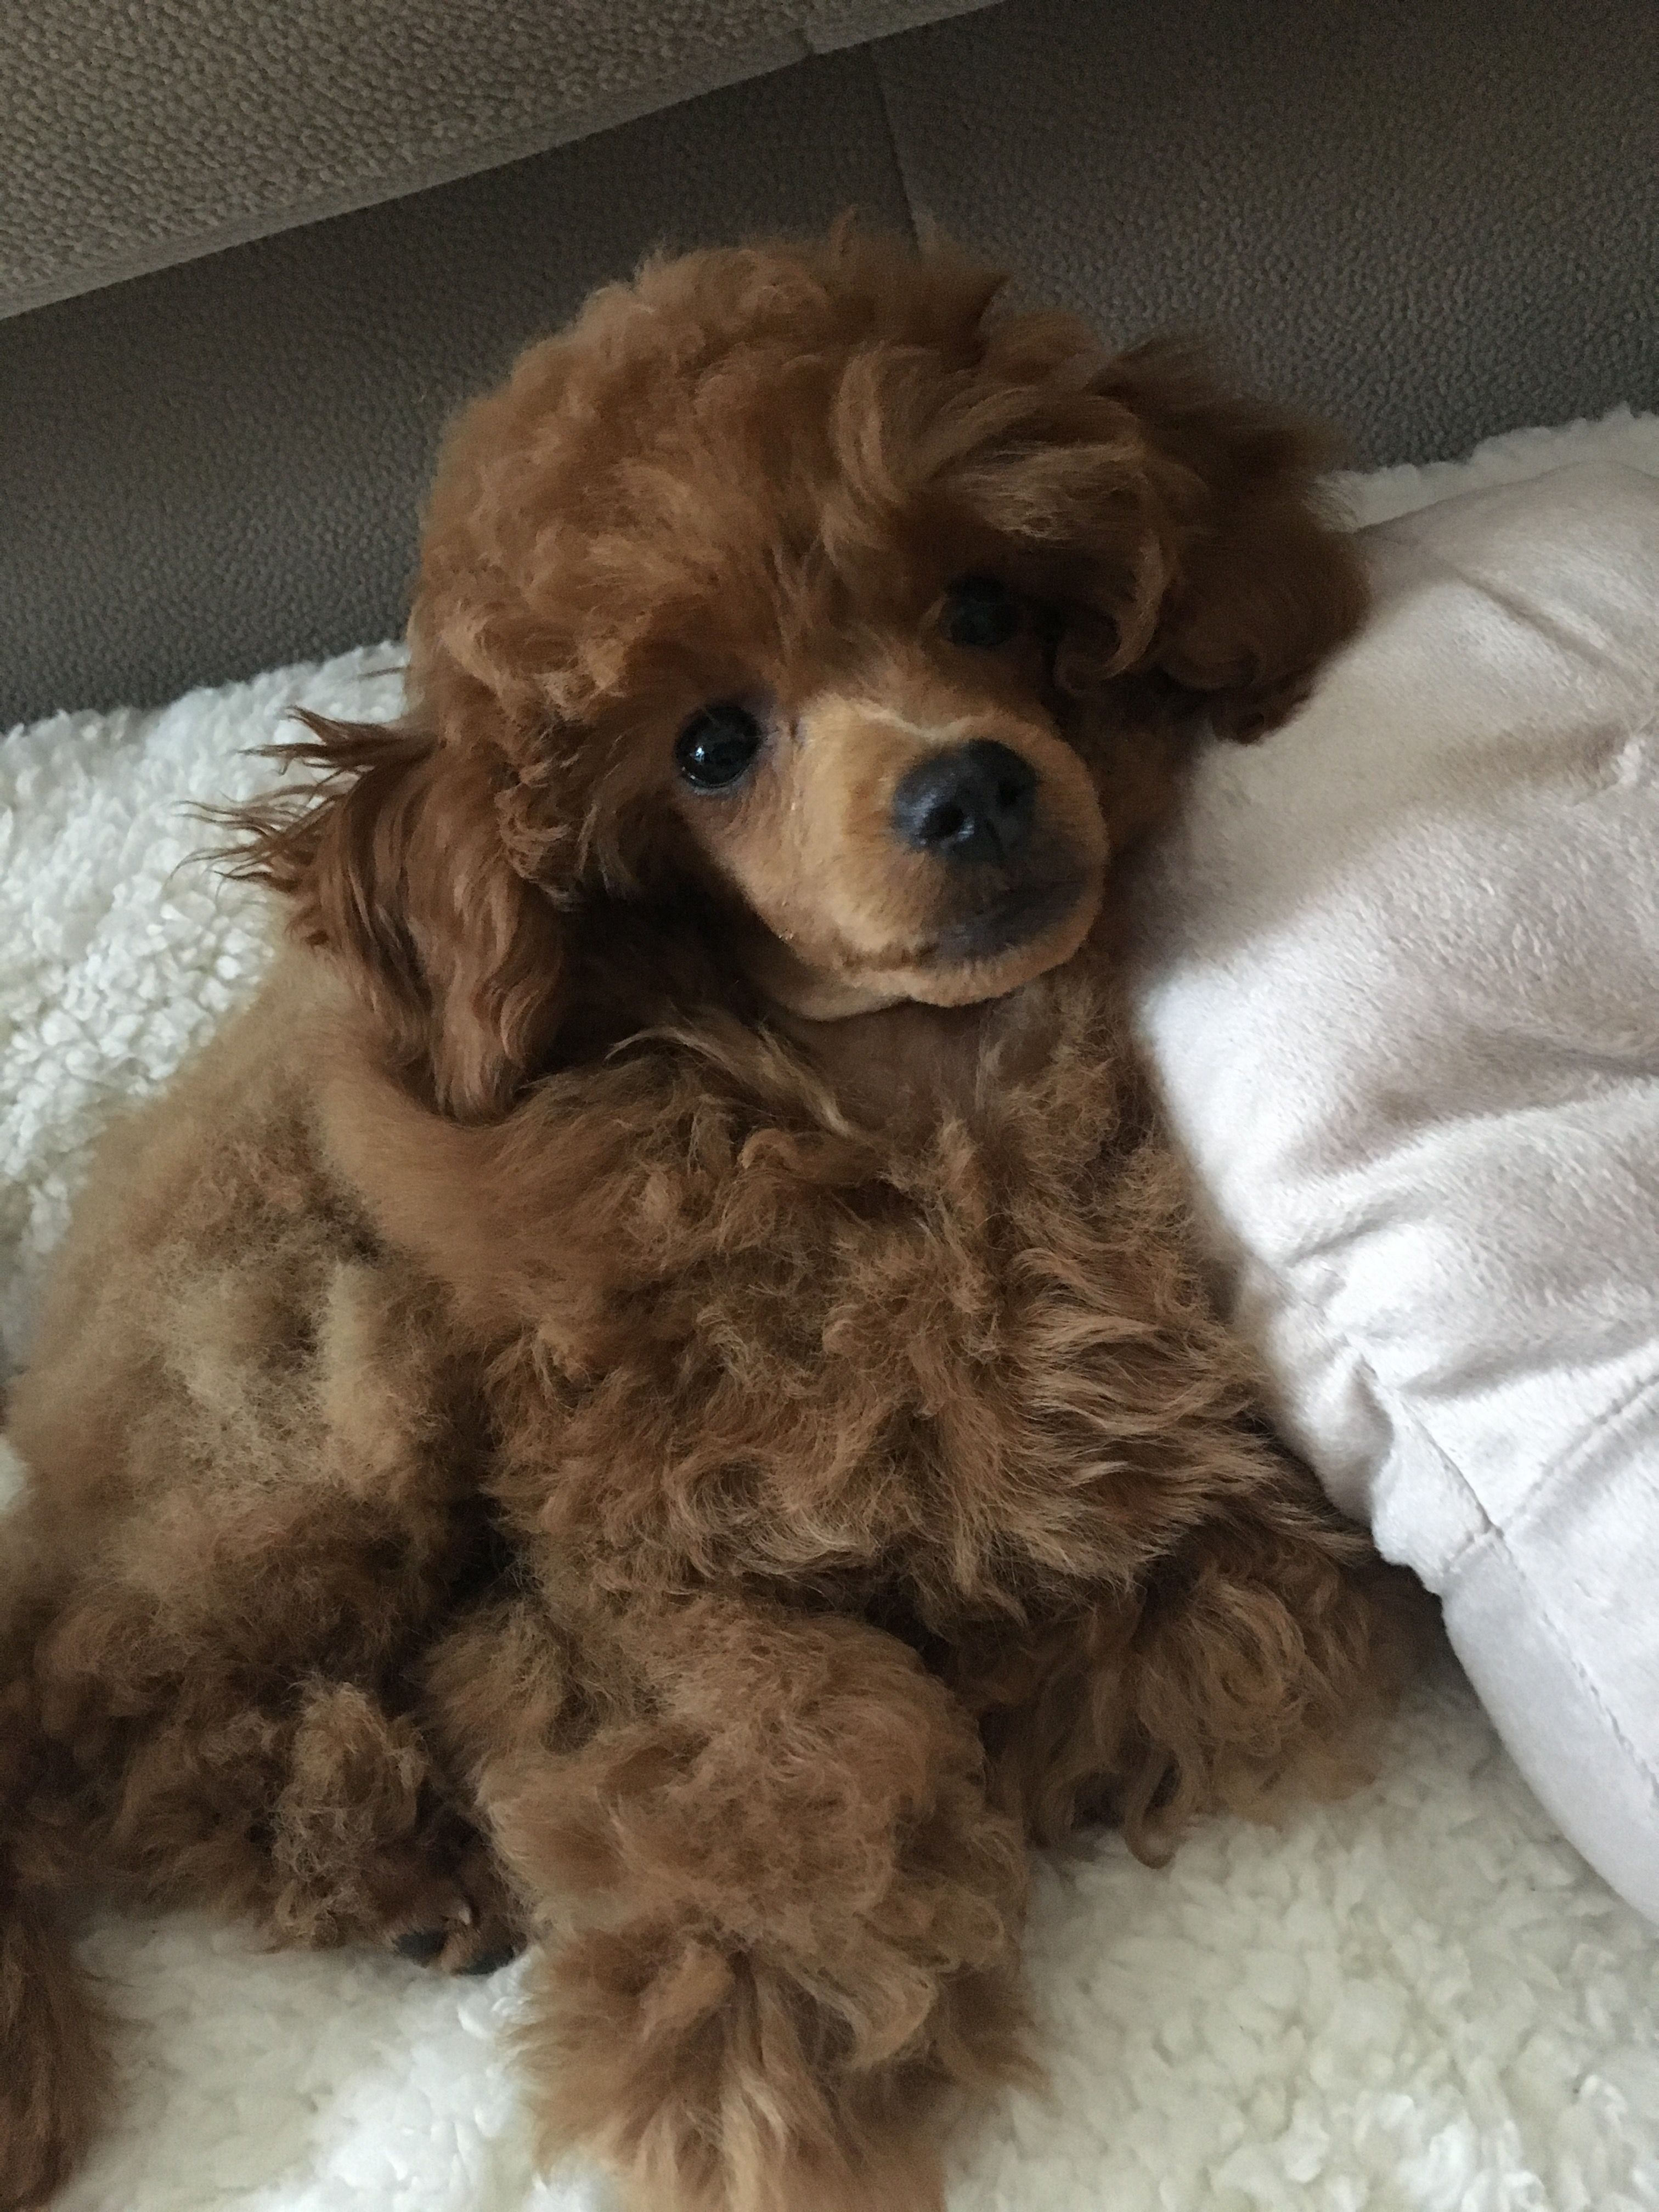 Poodle Toy Toypoodle Red Redtoypoodle Pudel Caniche Uszkar